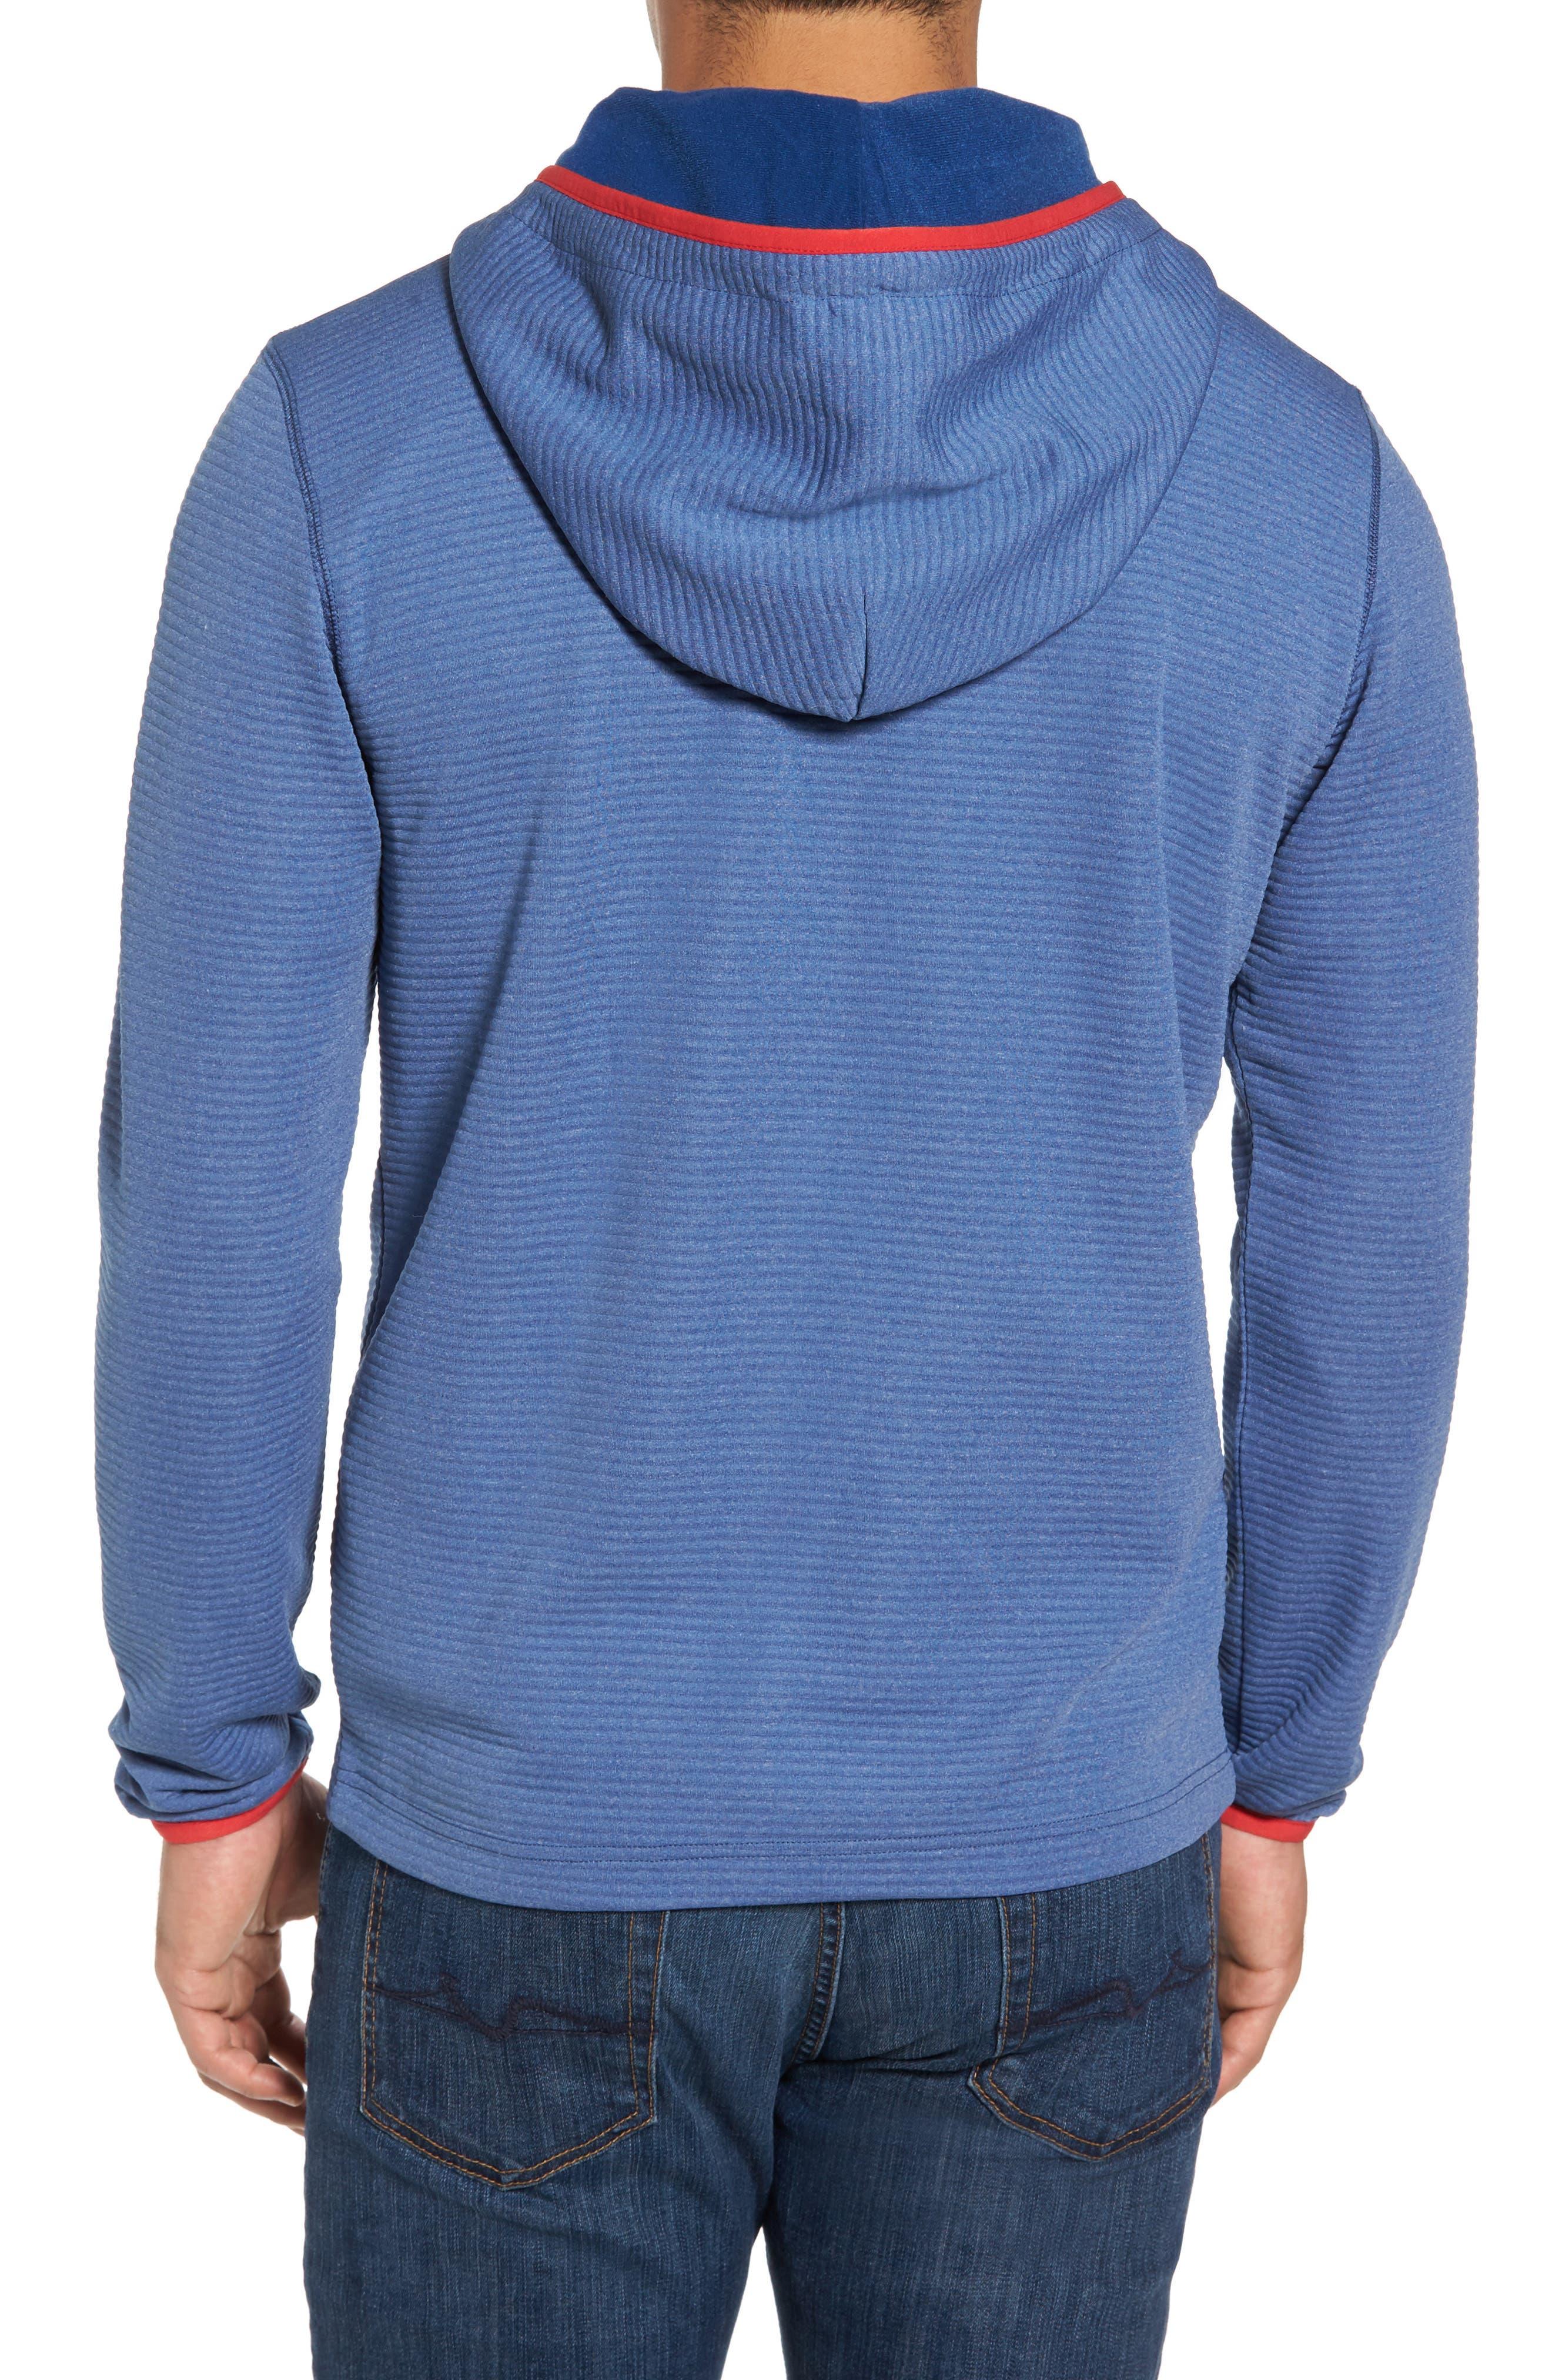 Furrow Quarter Zip Hoodie,                             Alternate thumbnail 2, color,                             Seven Seas Blue